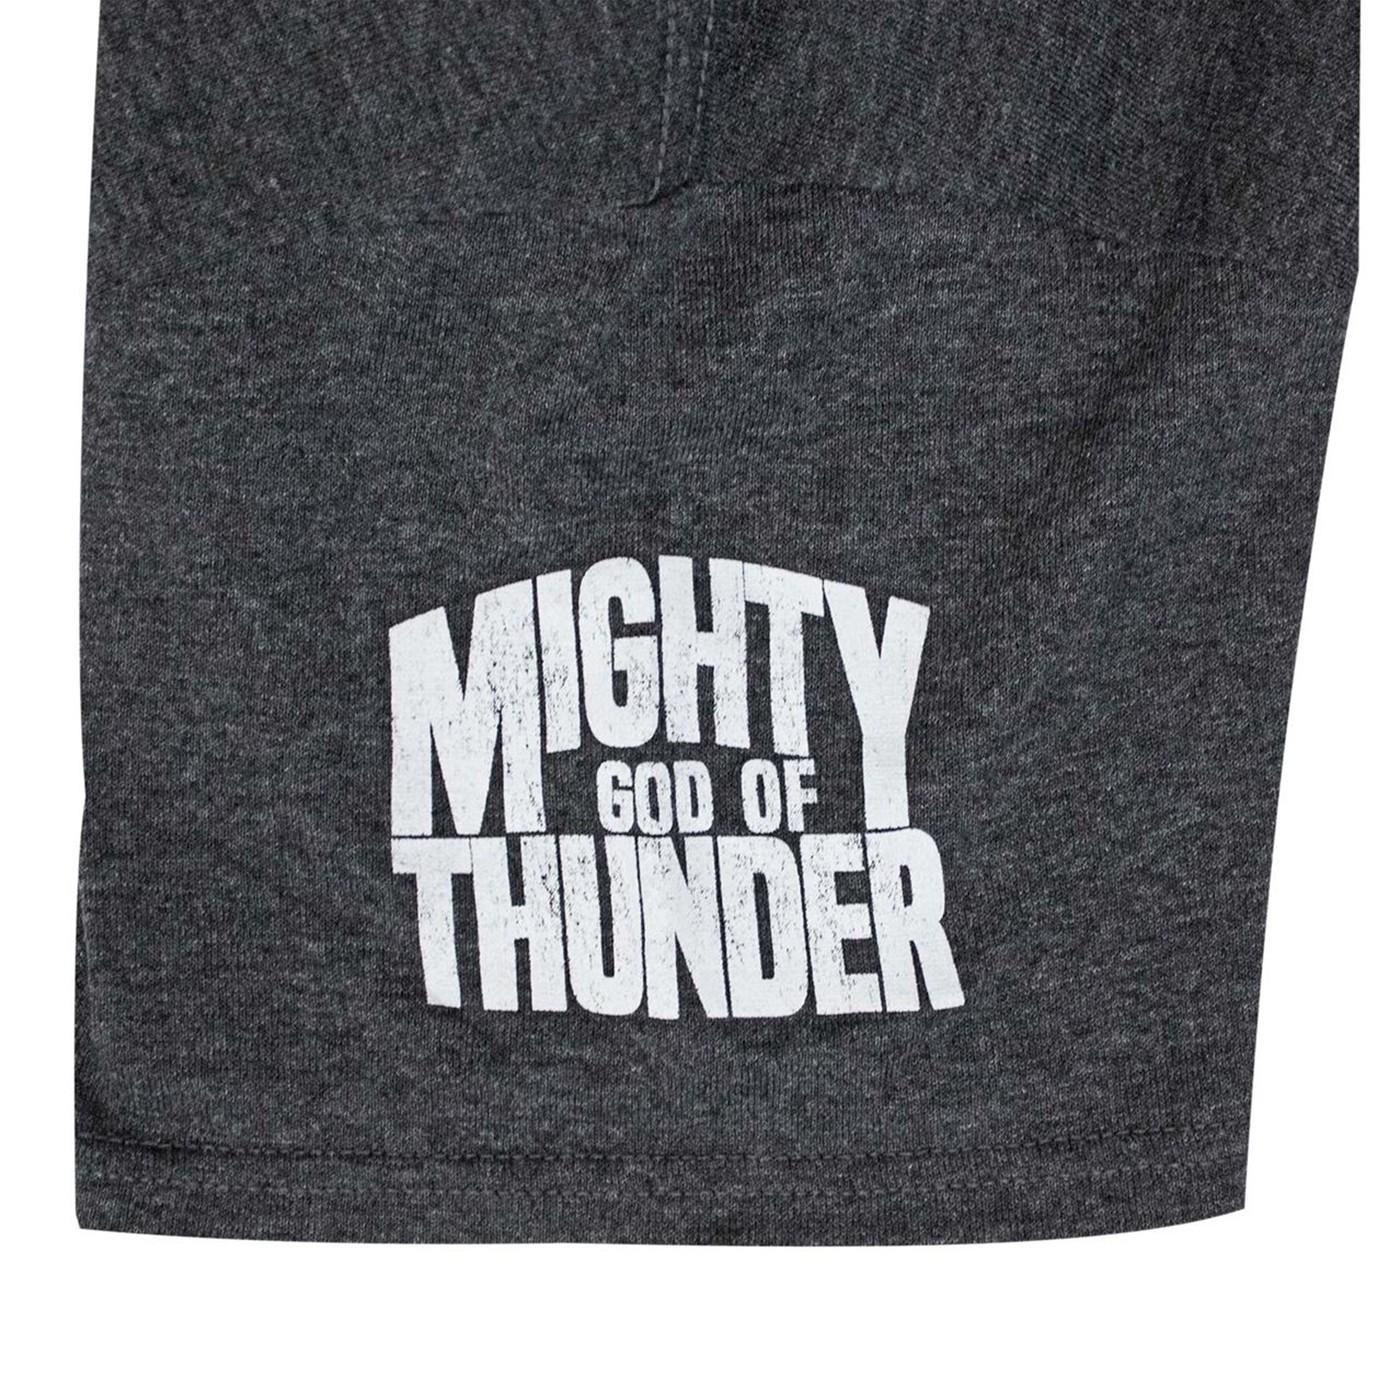 Thor Stormbreaker Men's T-Shirt